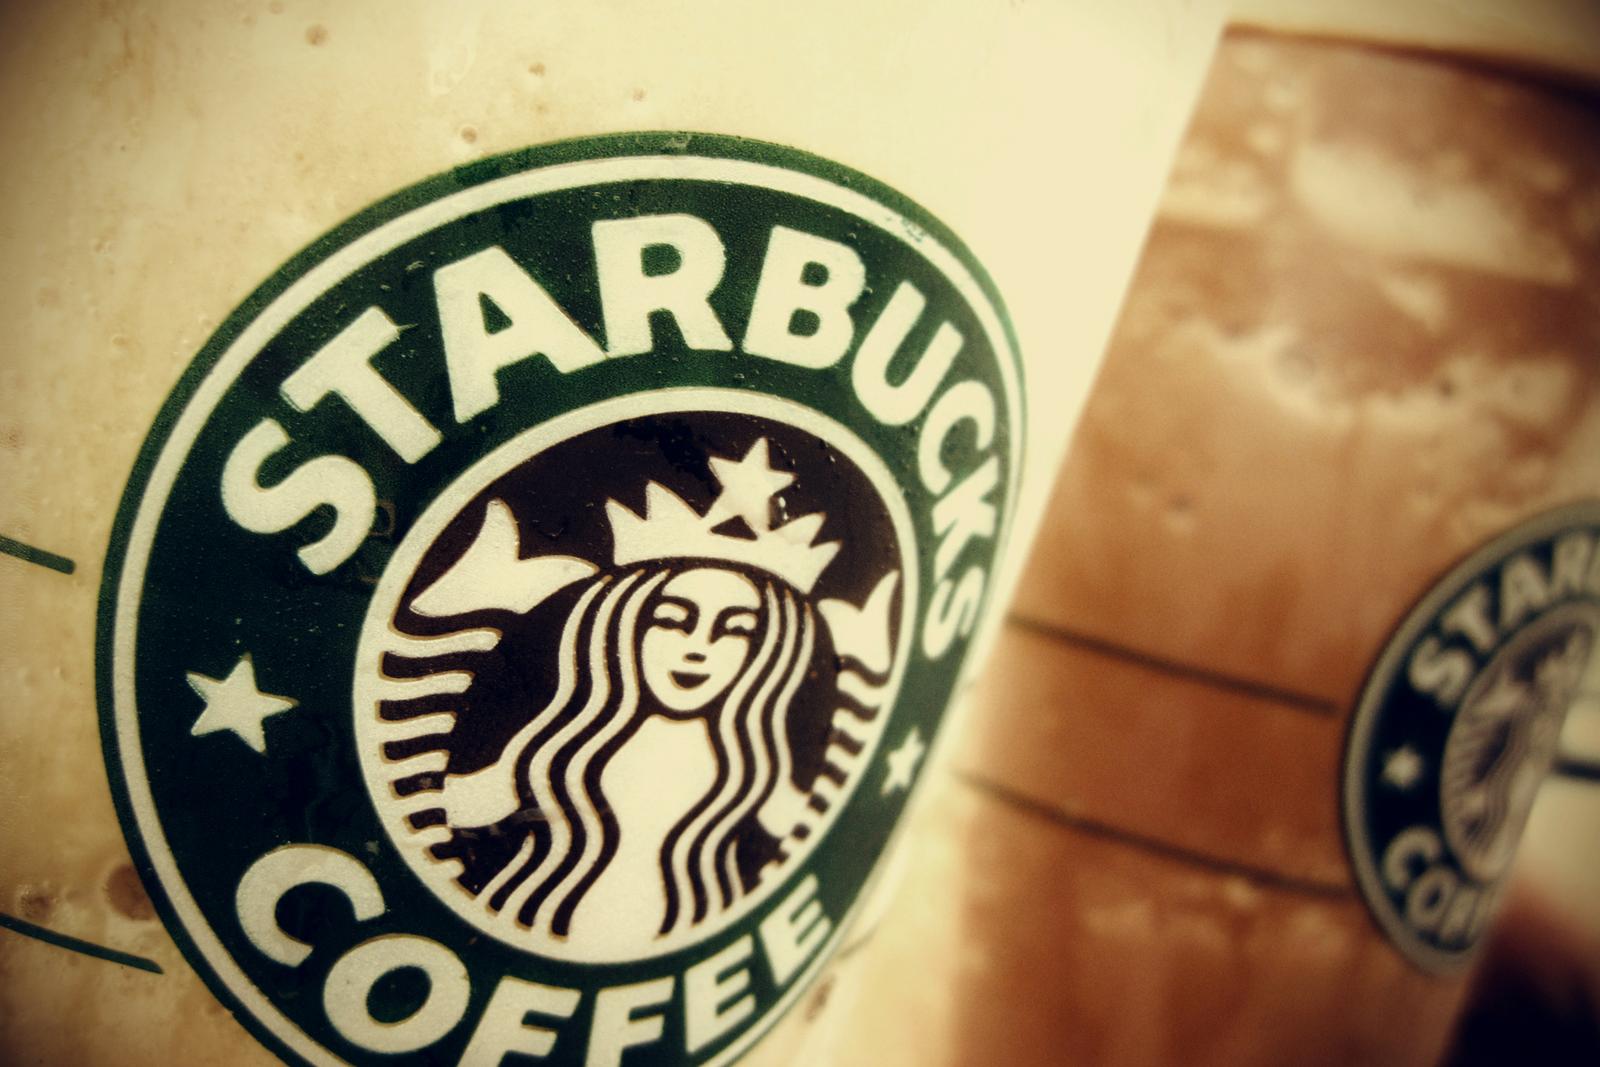 Corporate Upstanders: Marketing that Breaks Traditional Boundaries